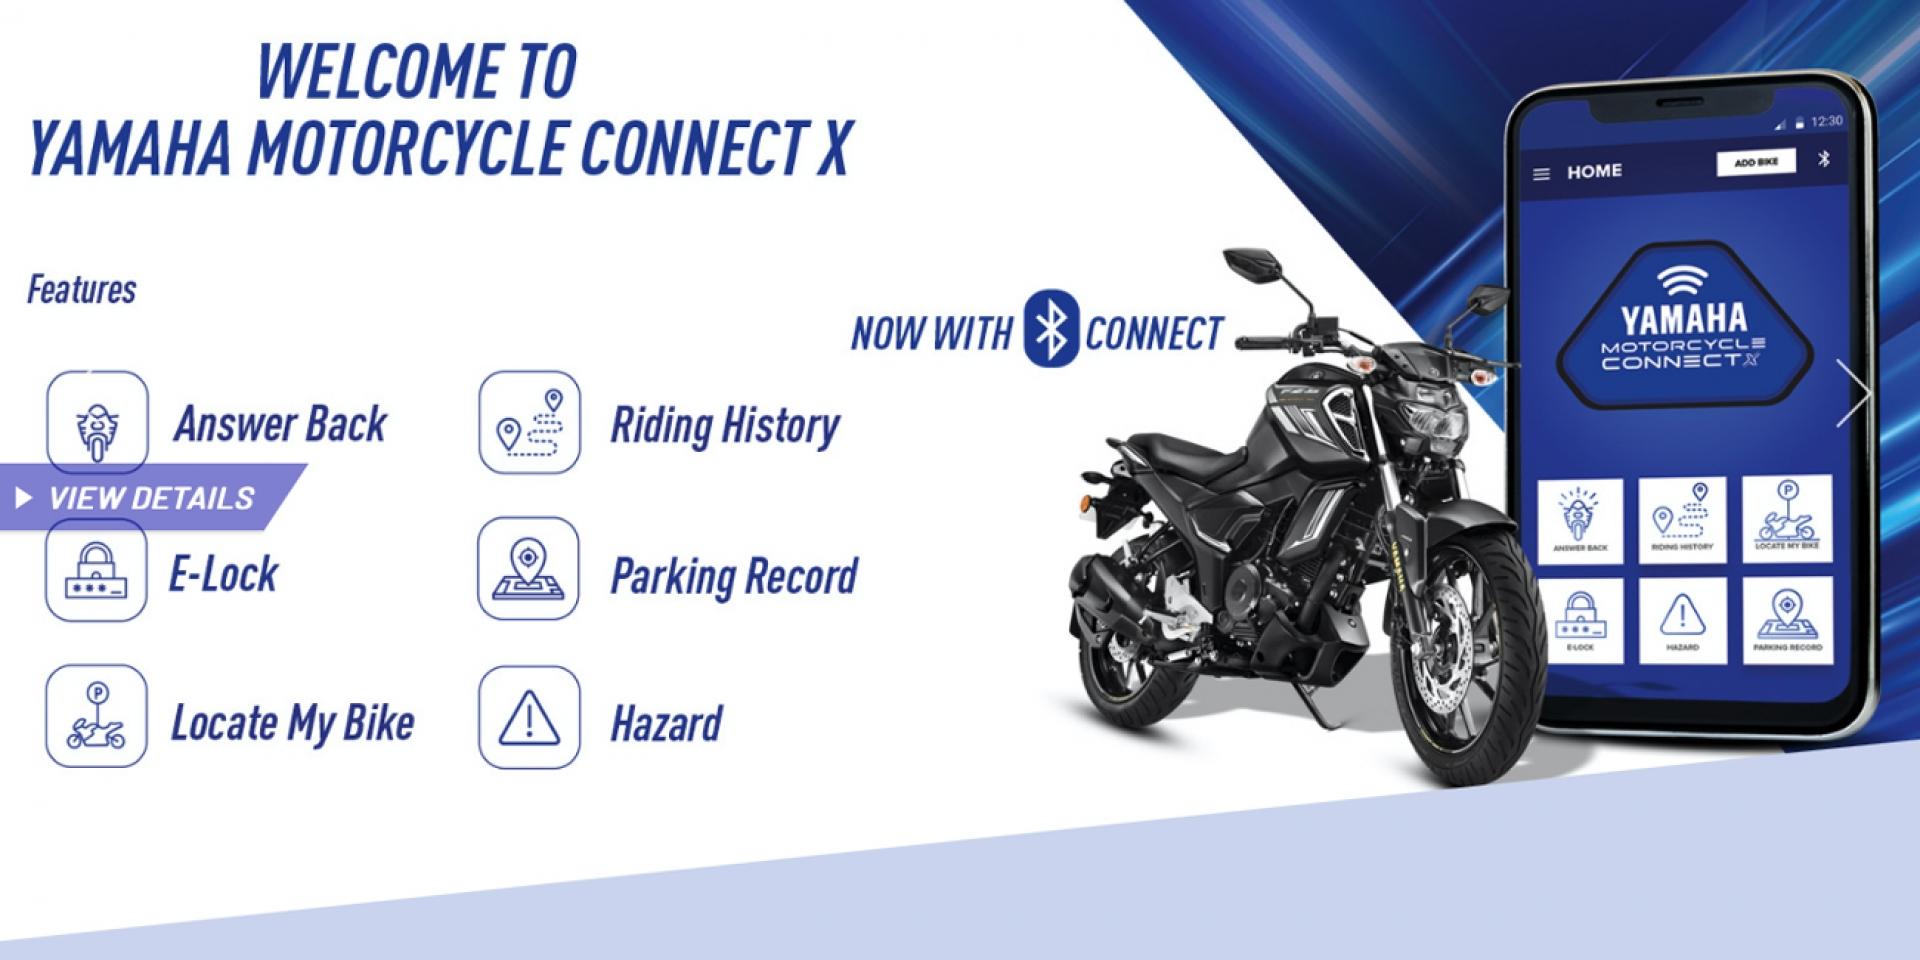 2021年式YAMAHA FZ-S 150新增Connect X藍芽連線功能選配!